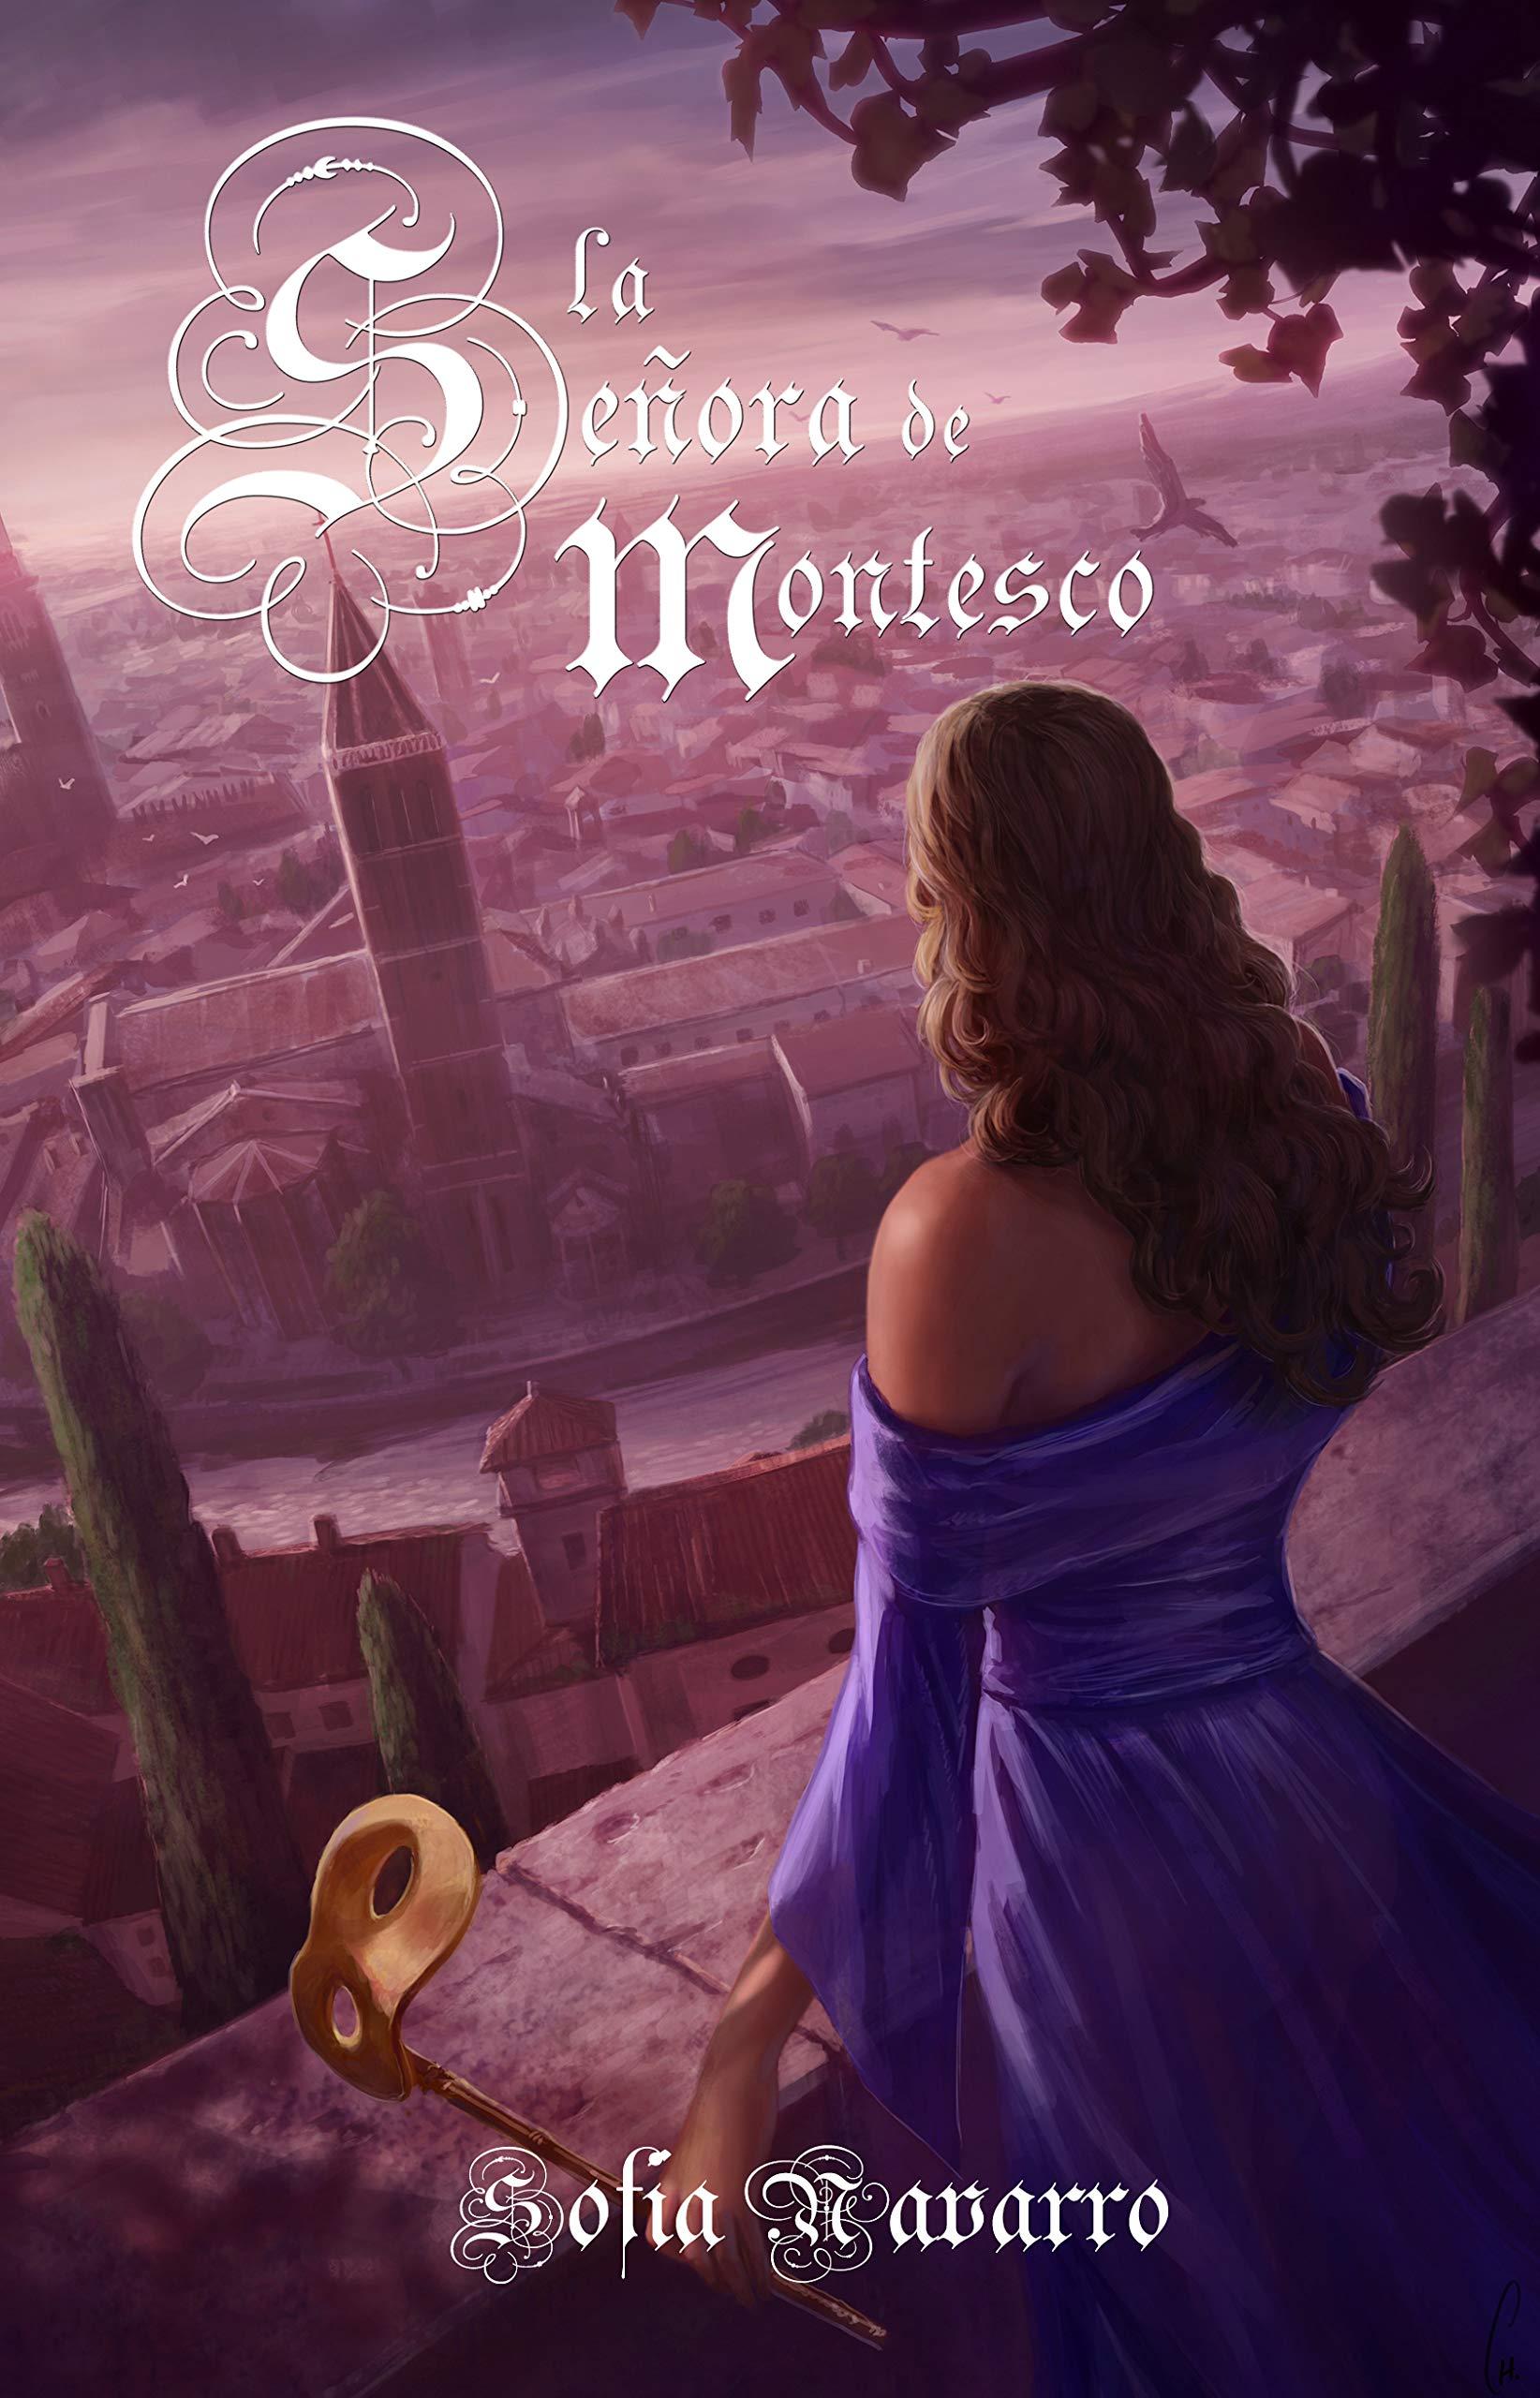 La Señora de Montesco